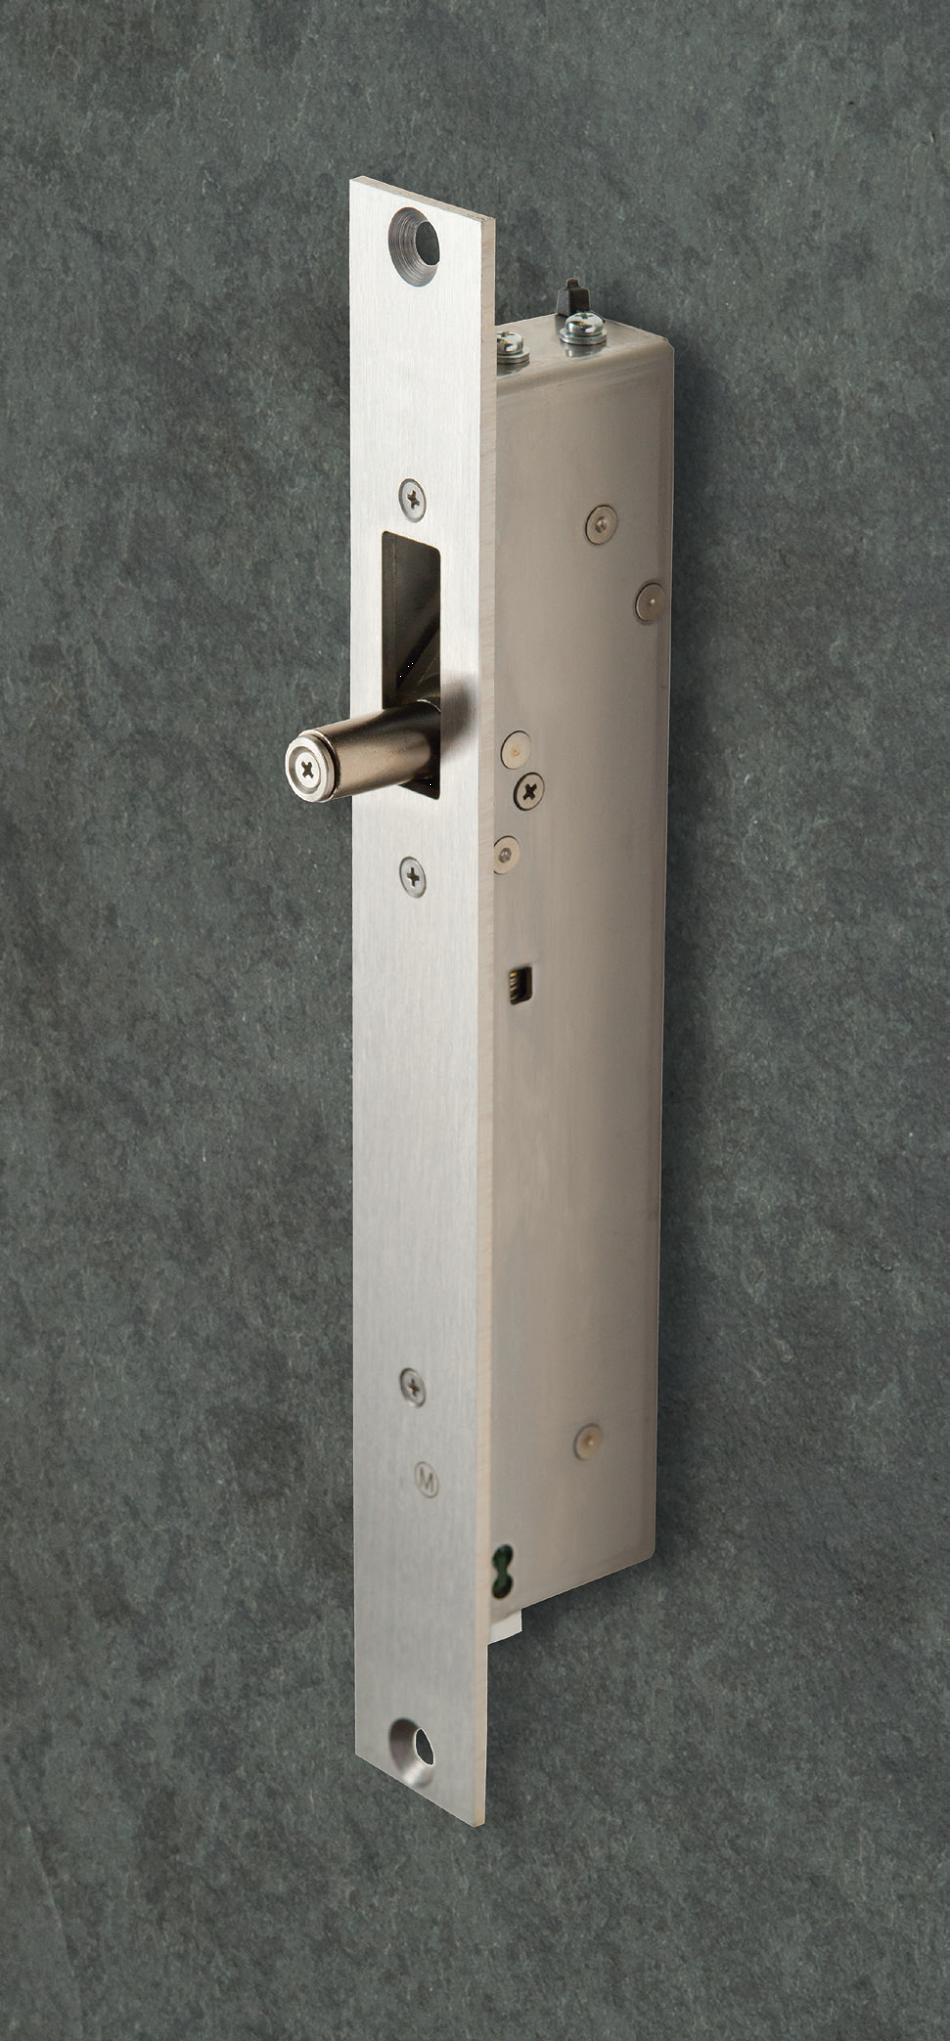 ASMEL004/005 - ASSA ABLOY Solenoid Lock